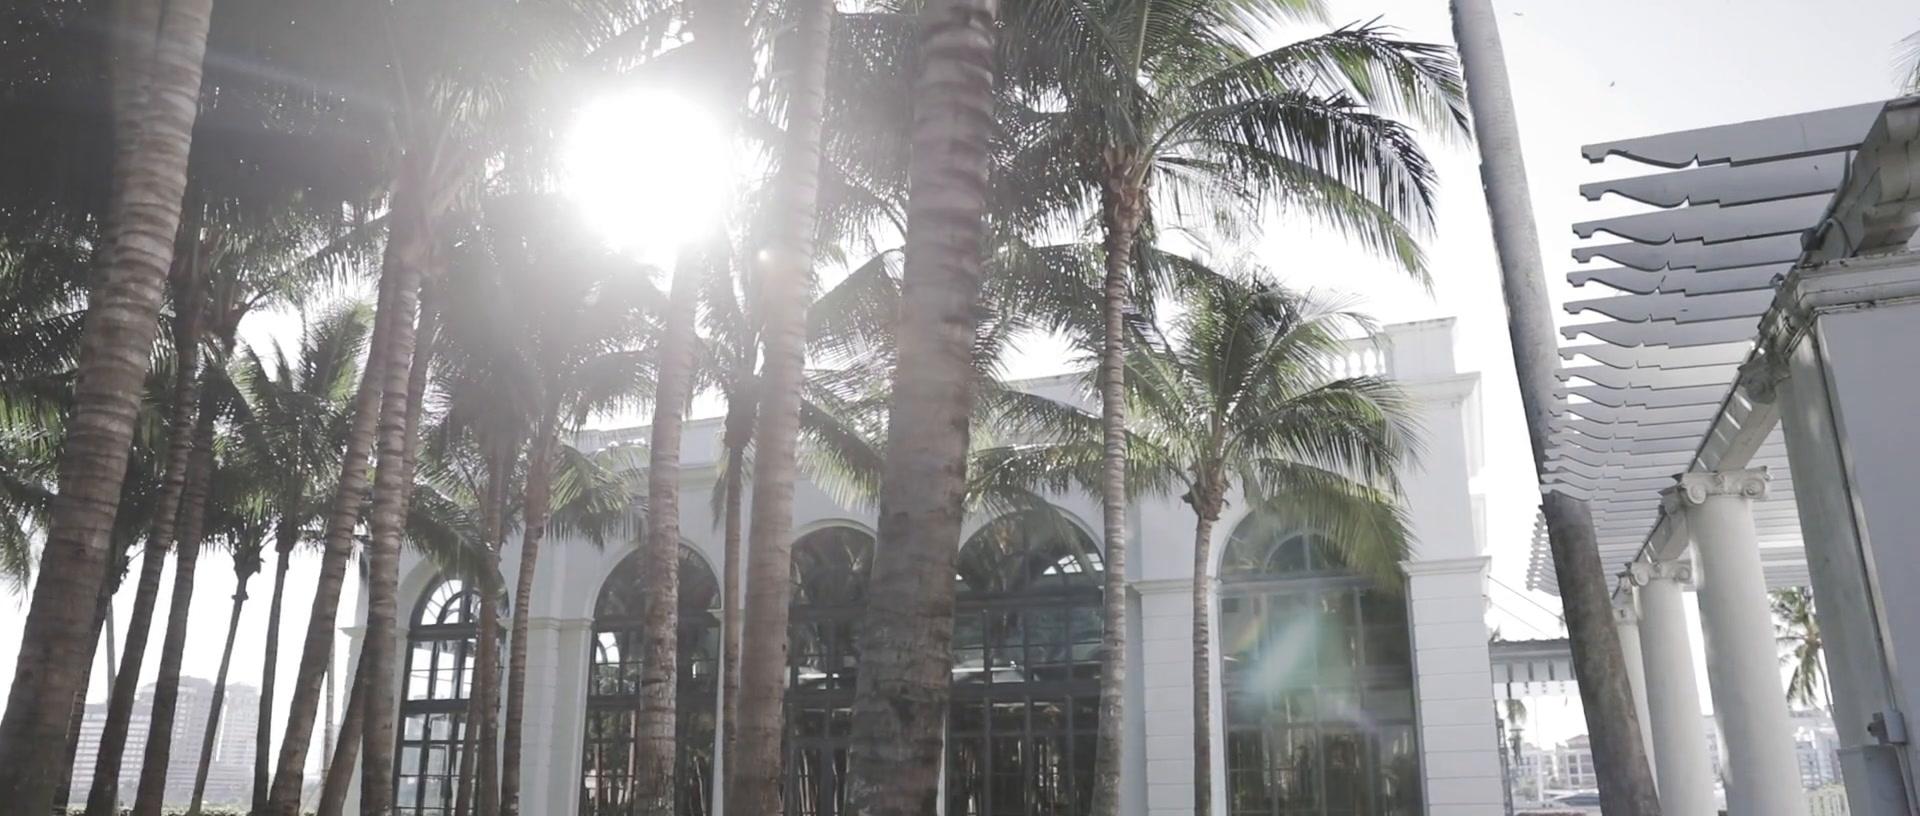 Brittany + Jad   Palm Beach, Florida   Henry Morrison Flagler Museum